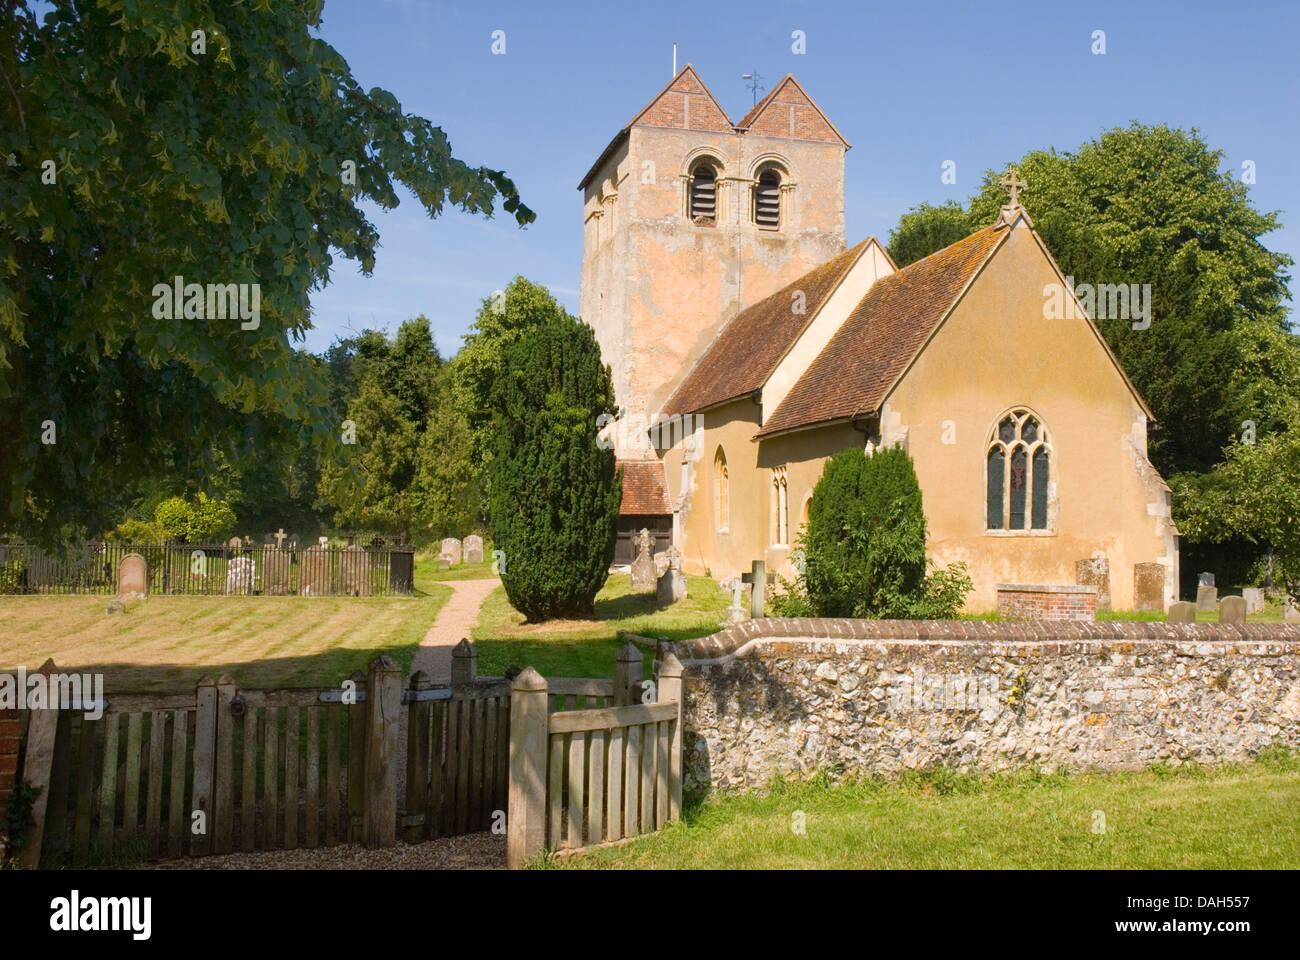 Bucks - Chiltern Hills - Fingest village - Norman church  St Bartholomew - framed by trees - flint boundary walls Stock Photo